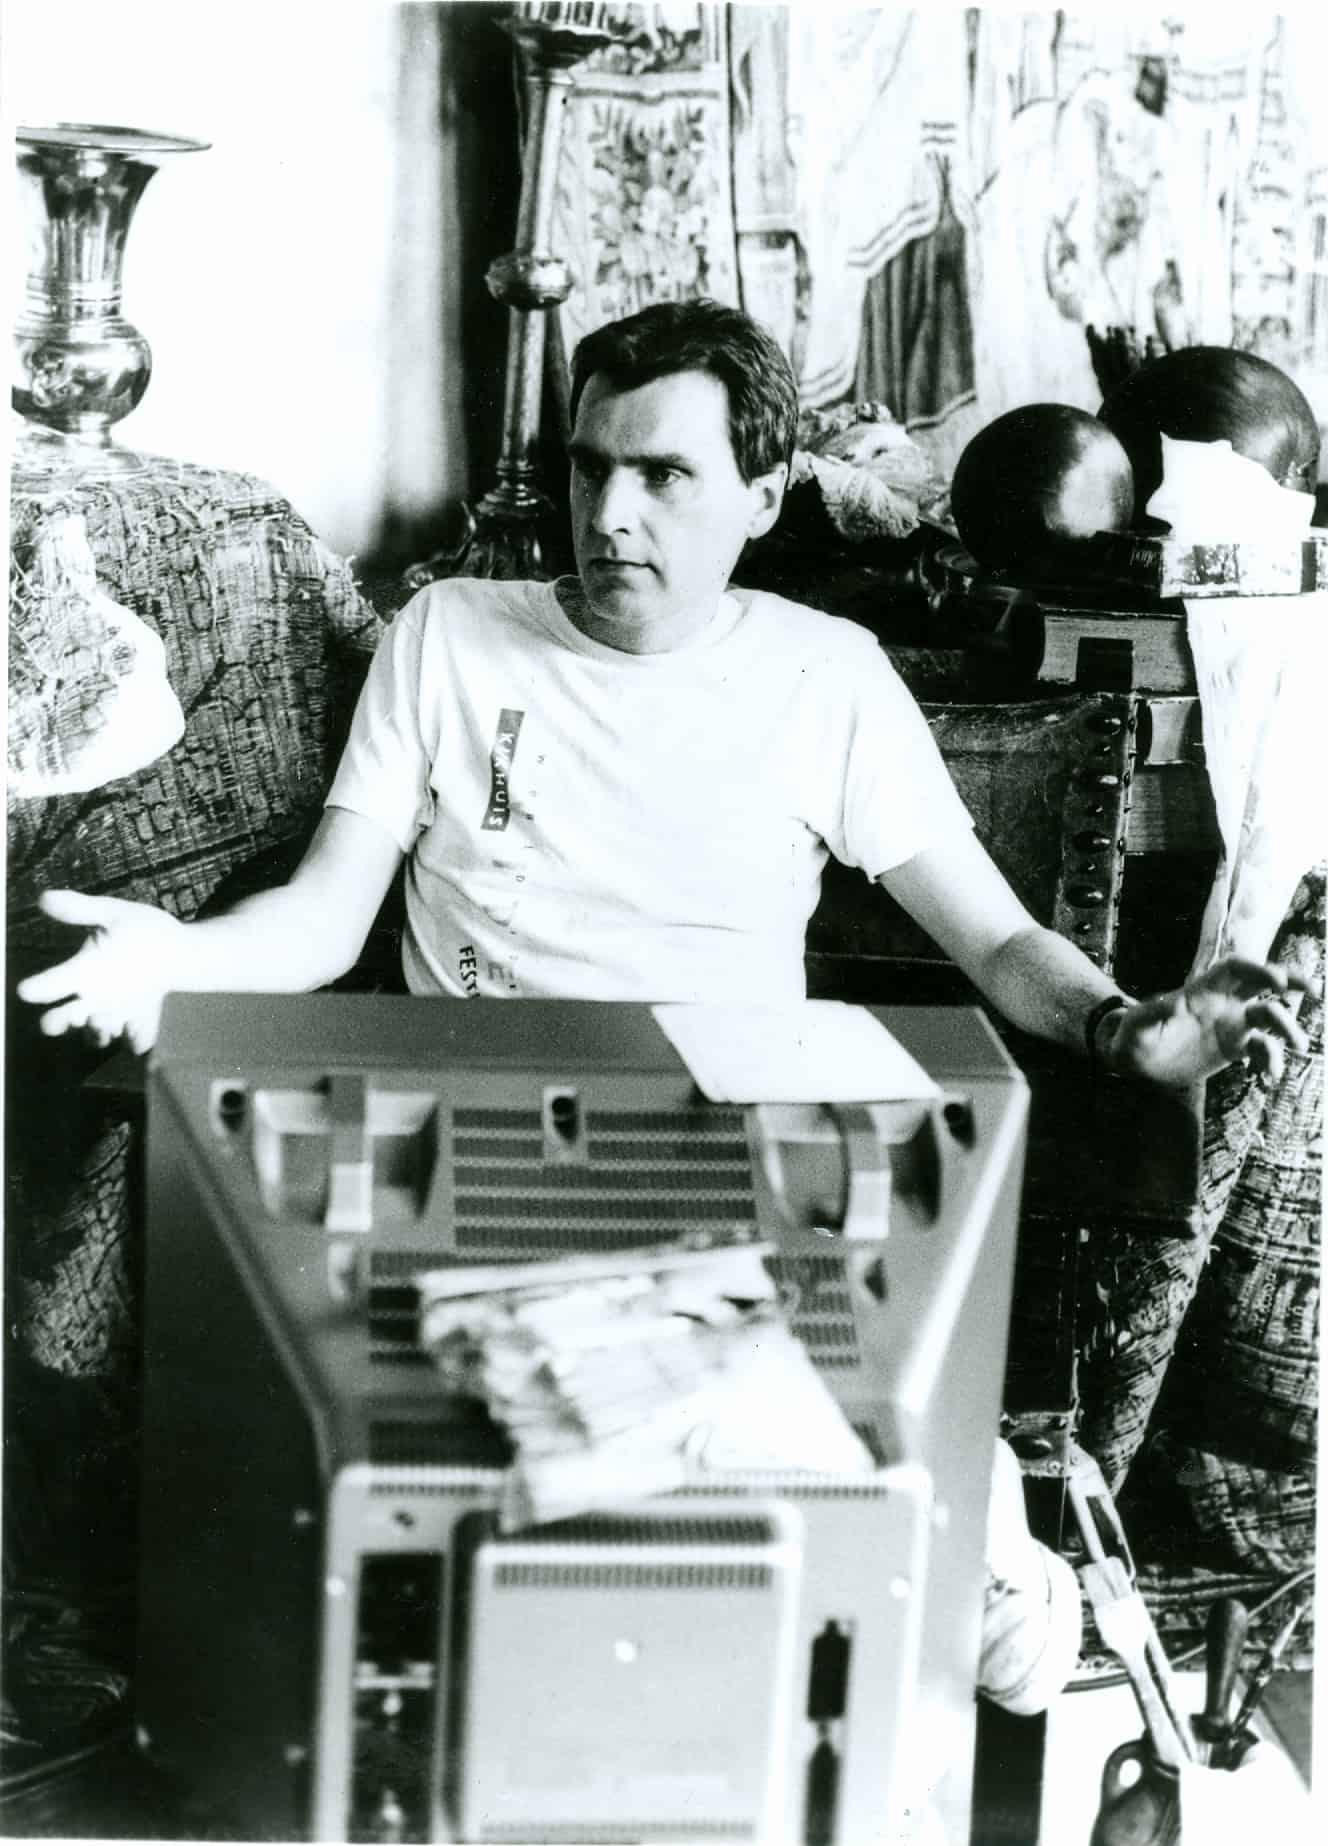 Dalibor Martinis, 1987. Rassegna internazionale video d'autore. Taormina.